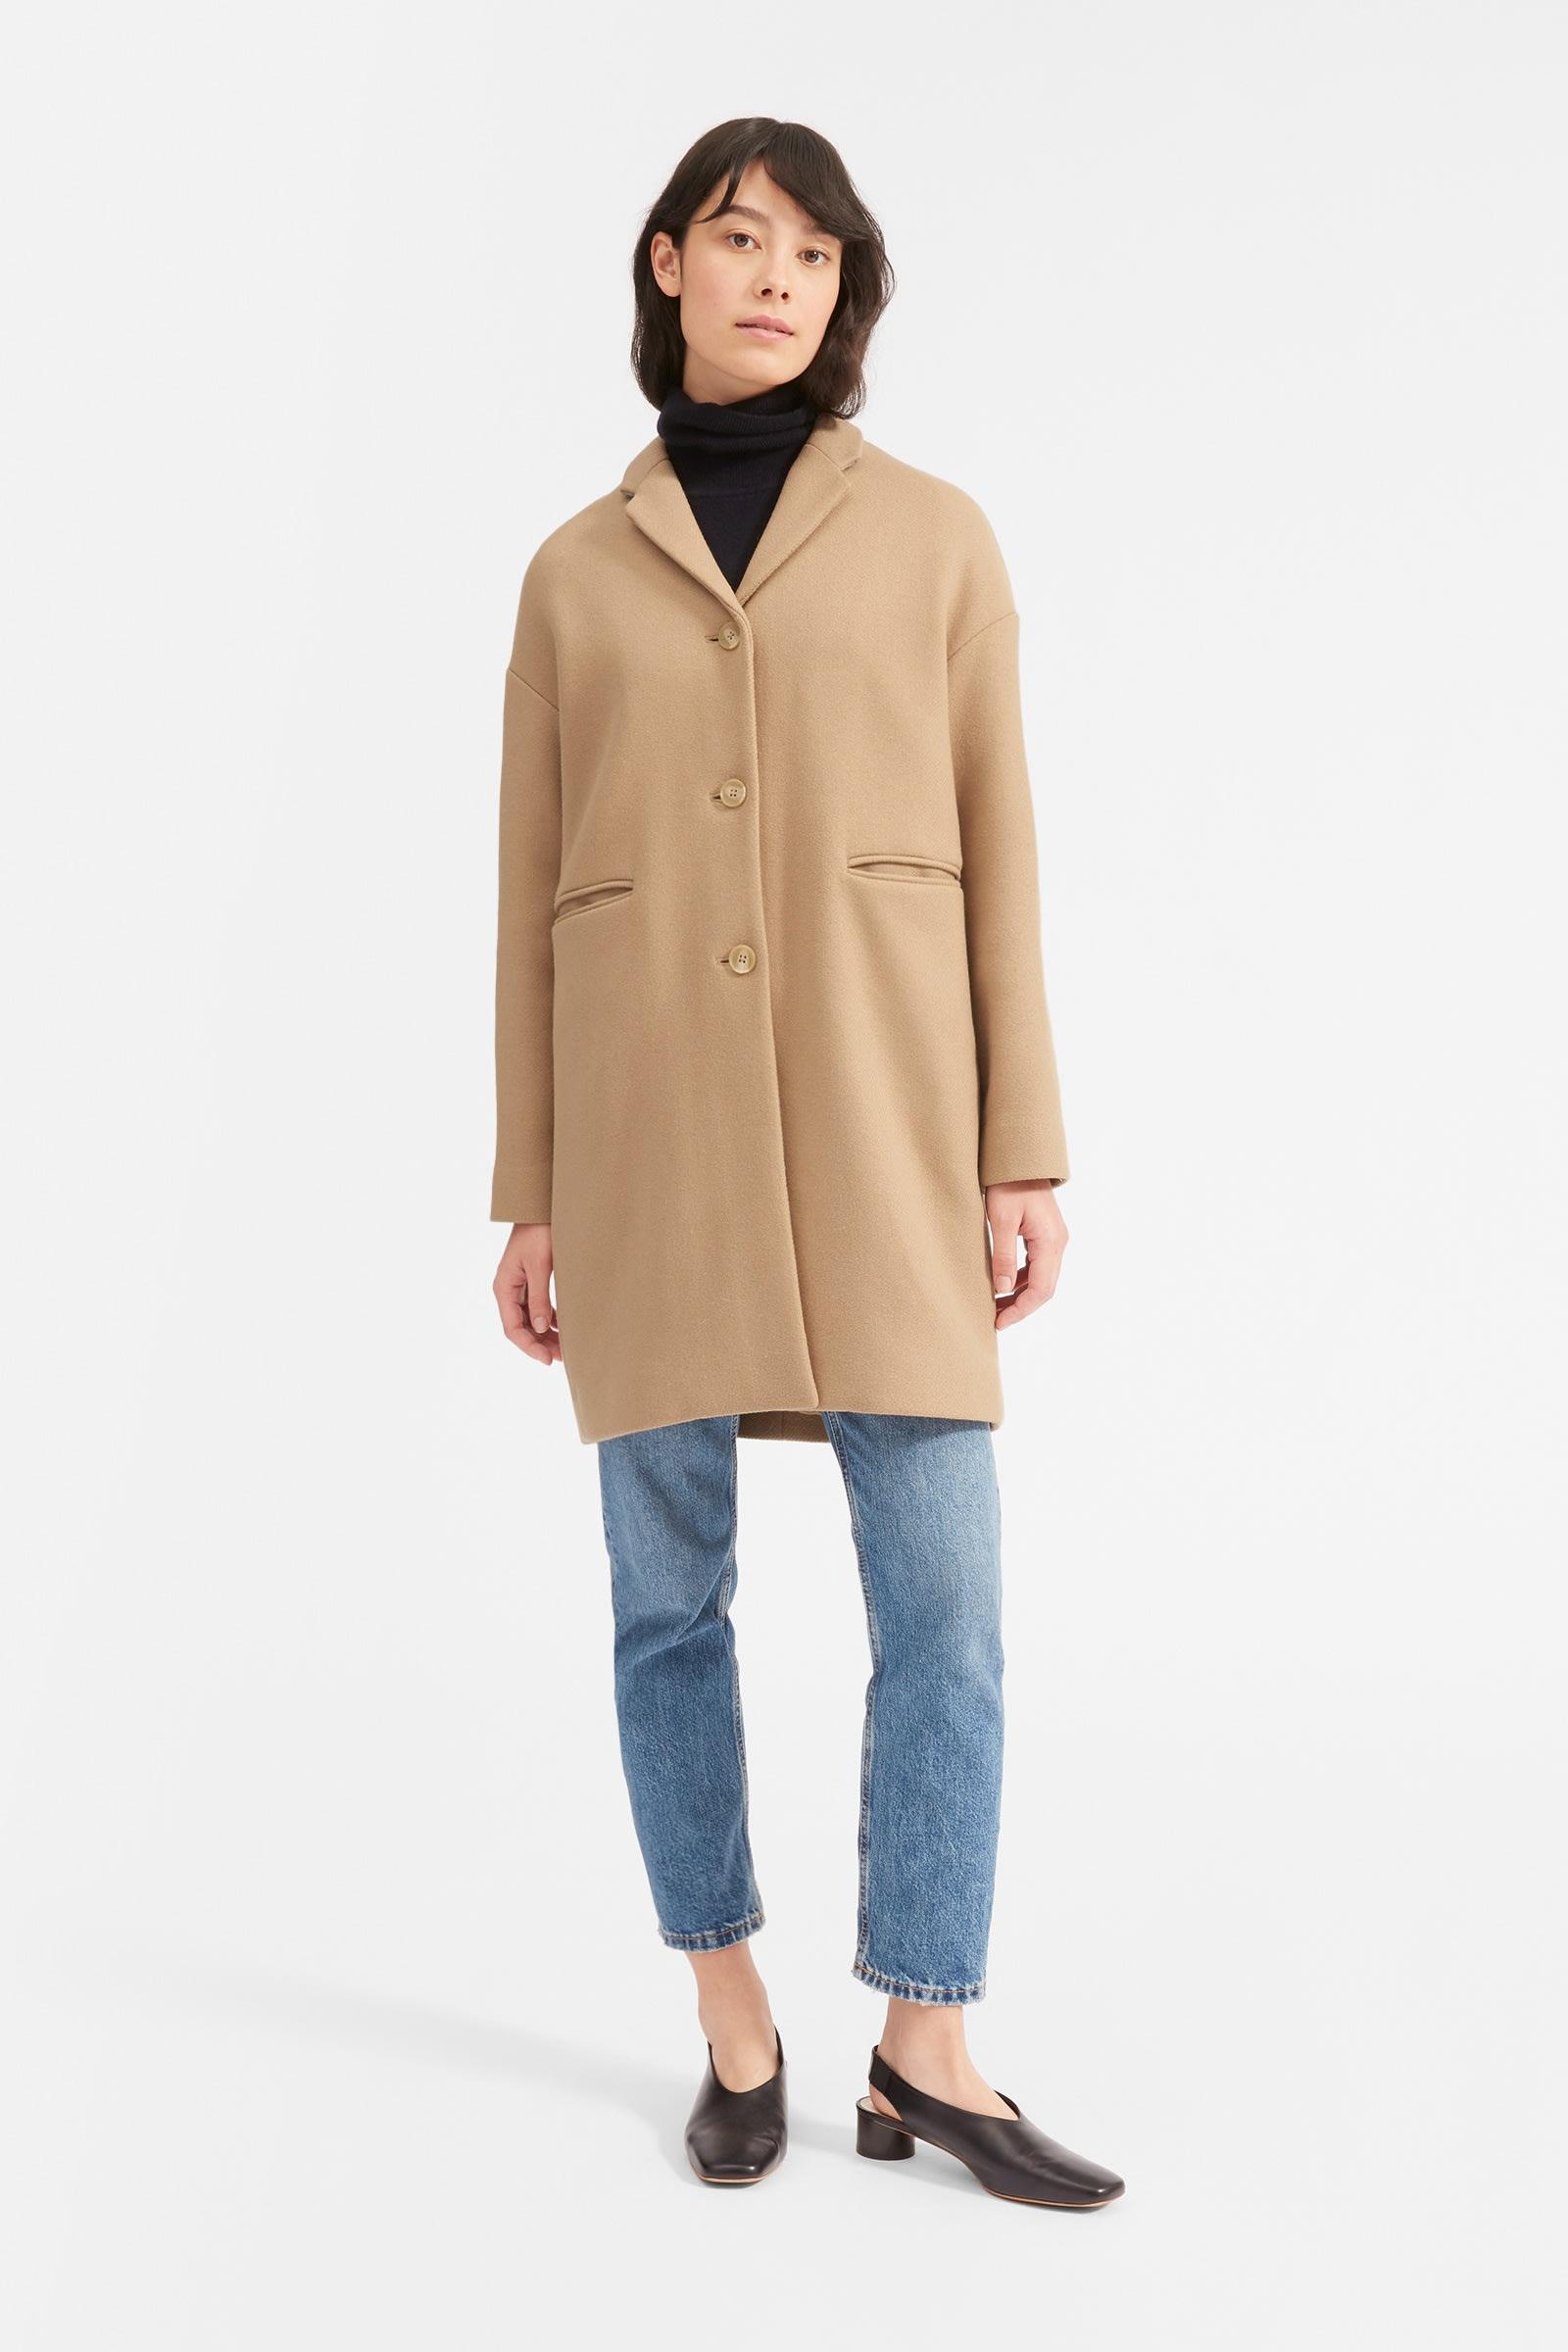 Camel Cocoon Coat, $250, Everlane